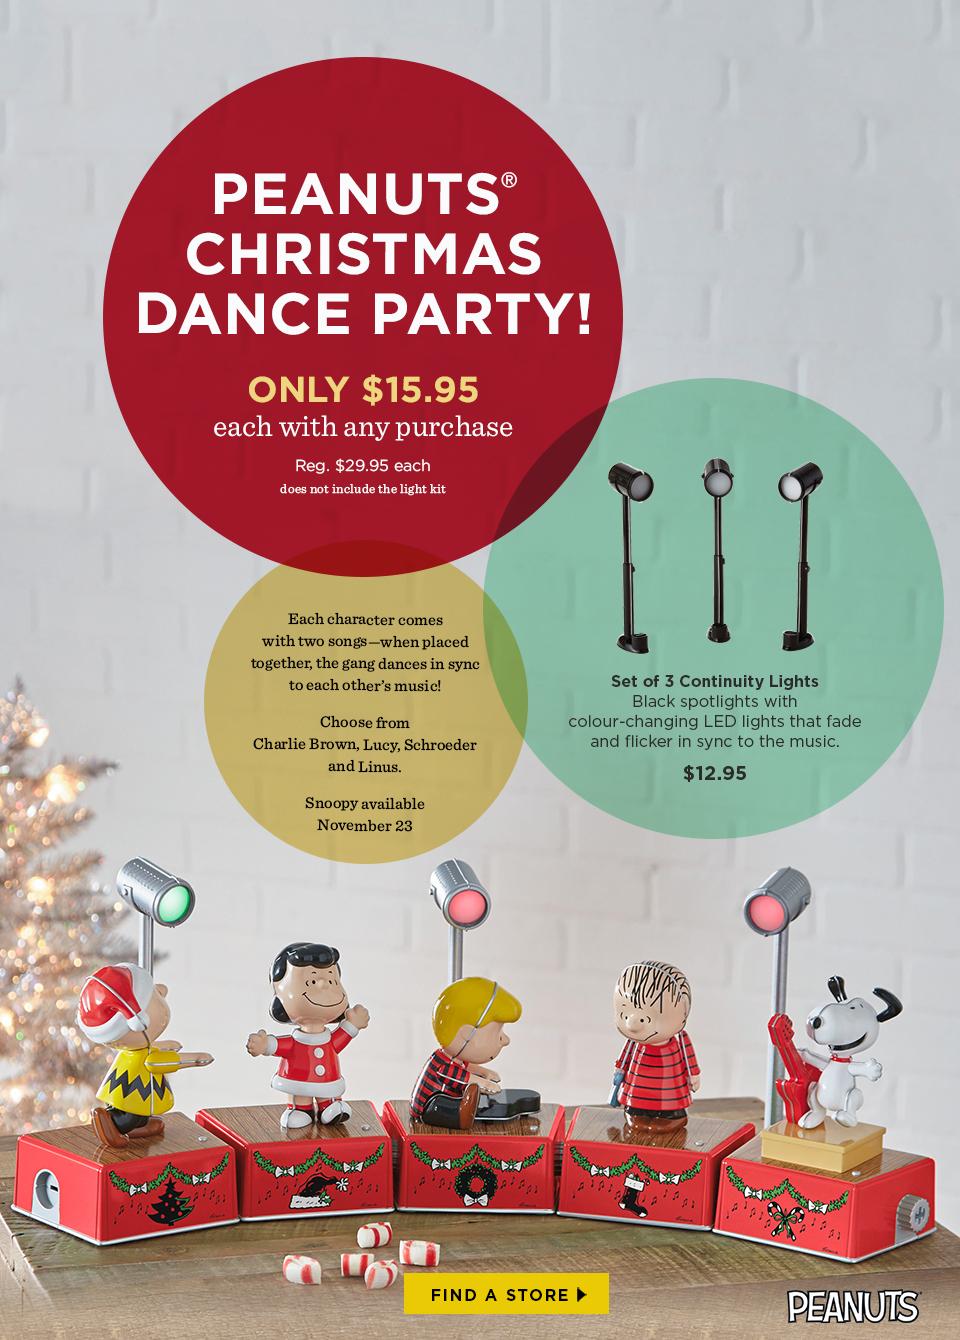 peanuts christmas dance party - Peanuts Christmas Dance